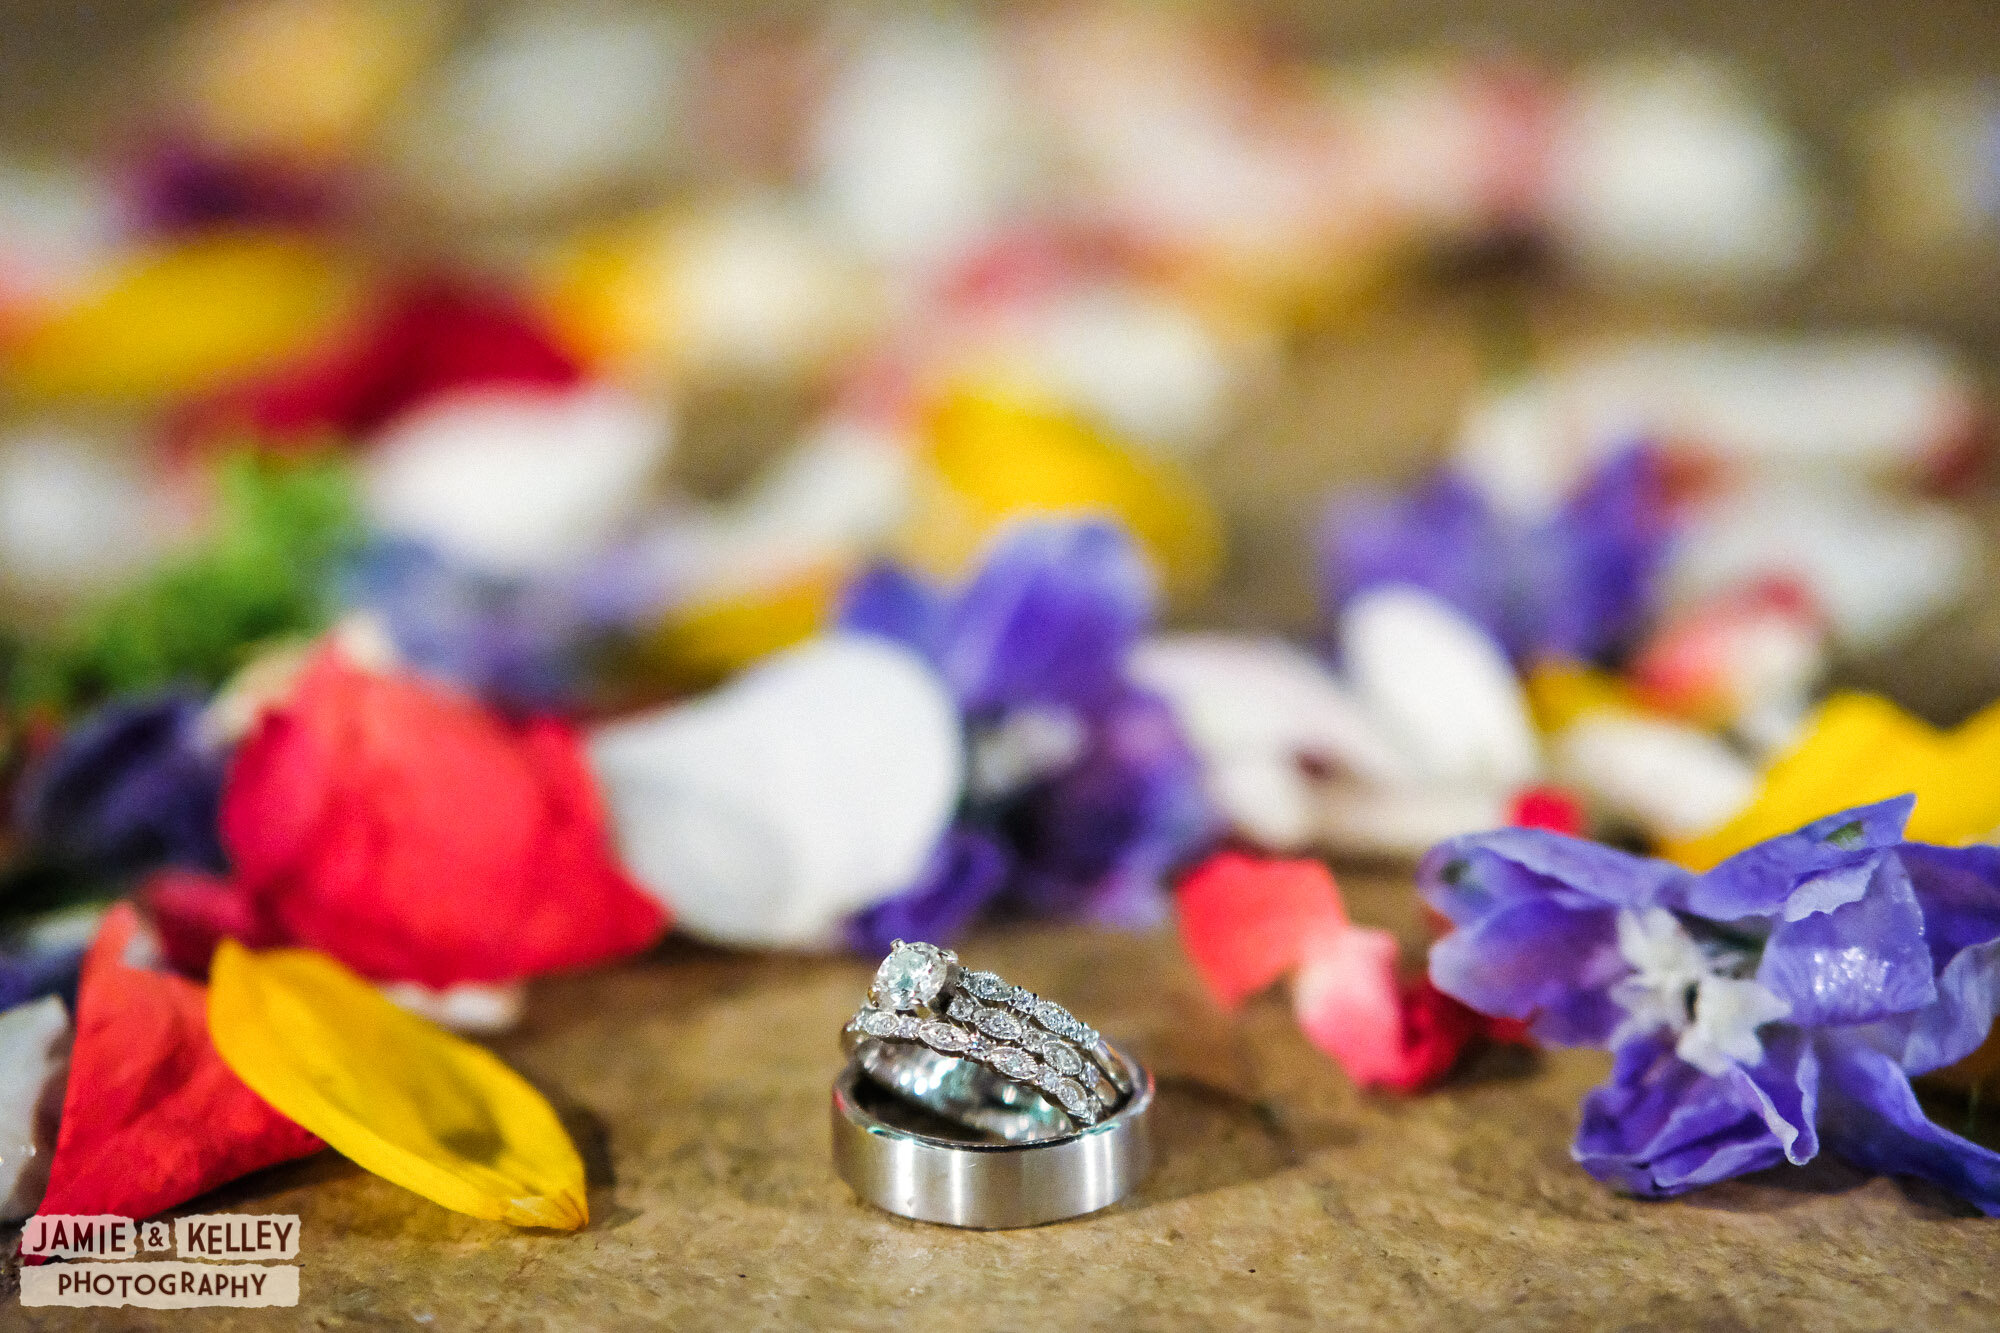 JK_ArinAndIsrael_WeddingTeasers_SprucedUp-05.jpg